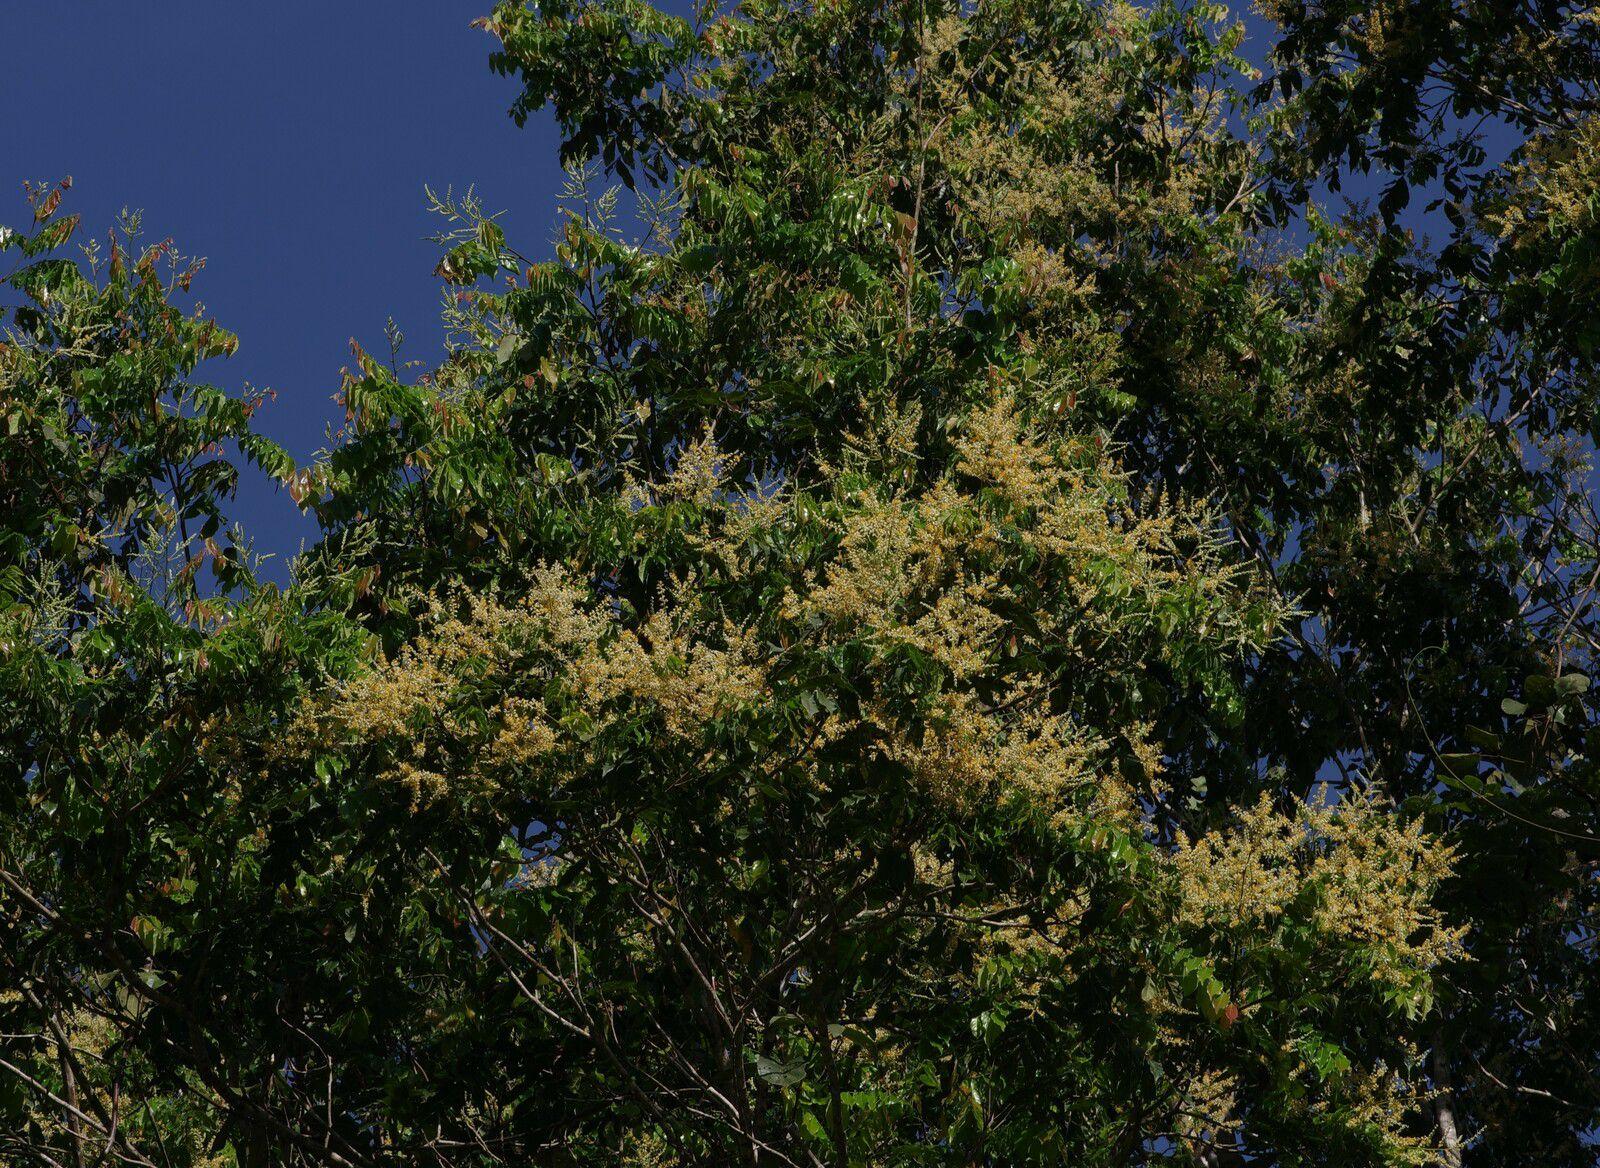 Tachigali melinonii